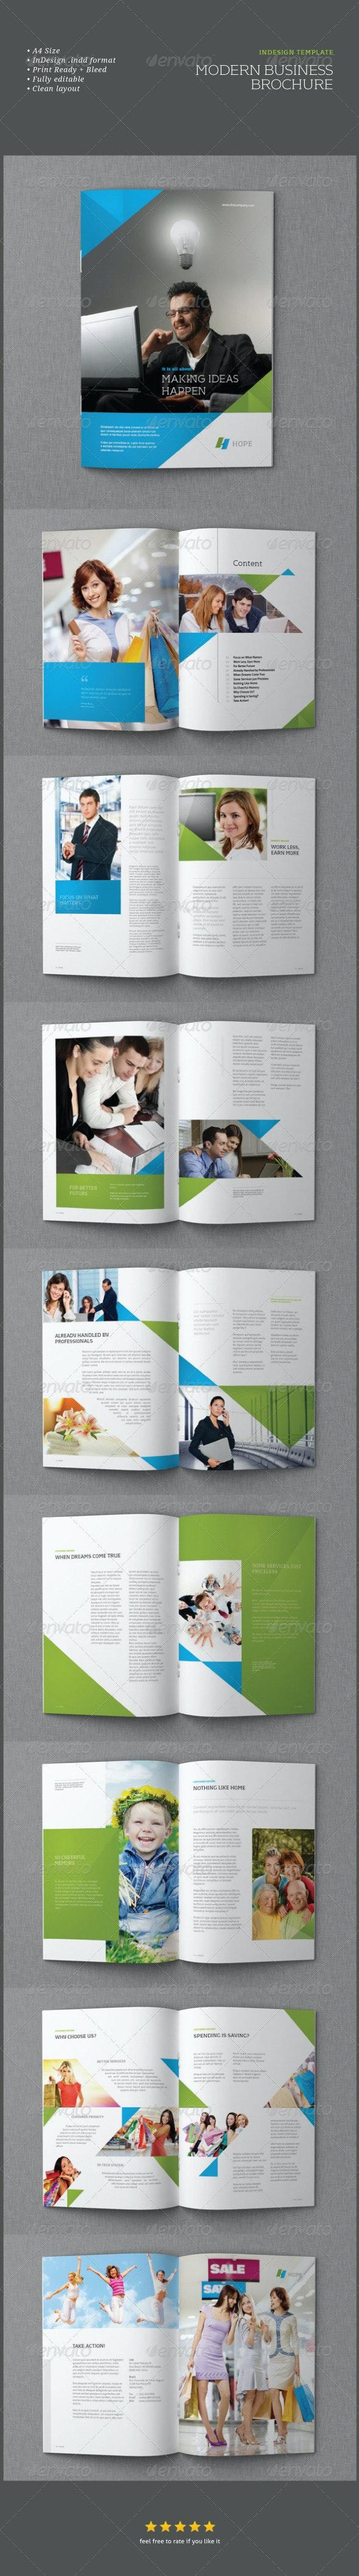 InDesign Modern Business Brochure Template - Corporate Brochures